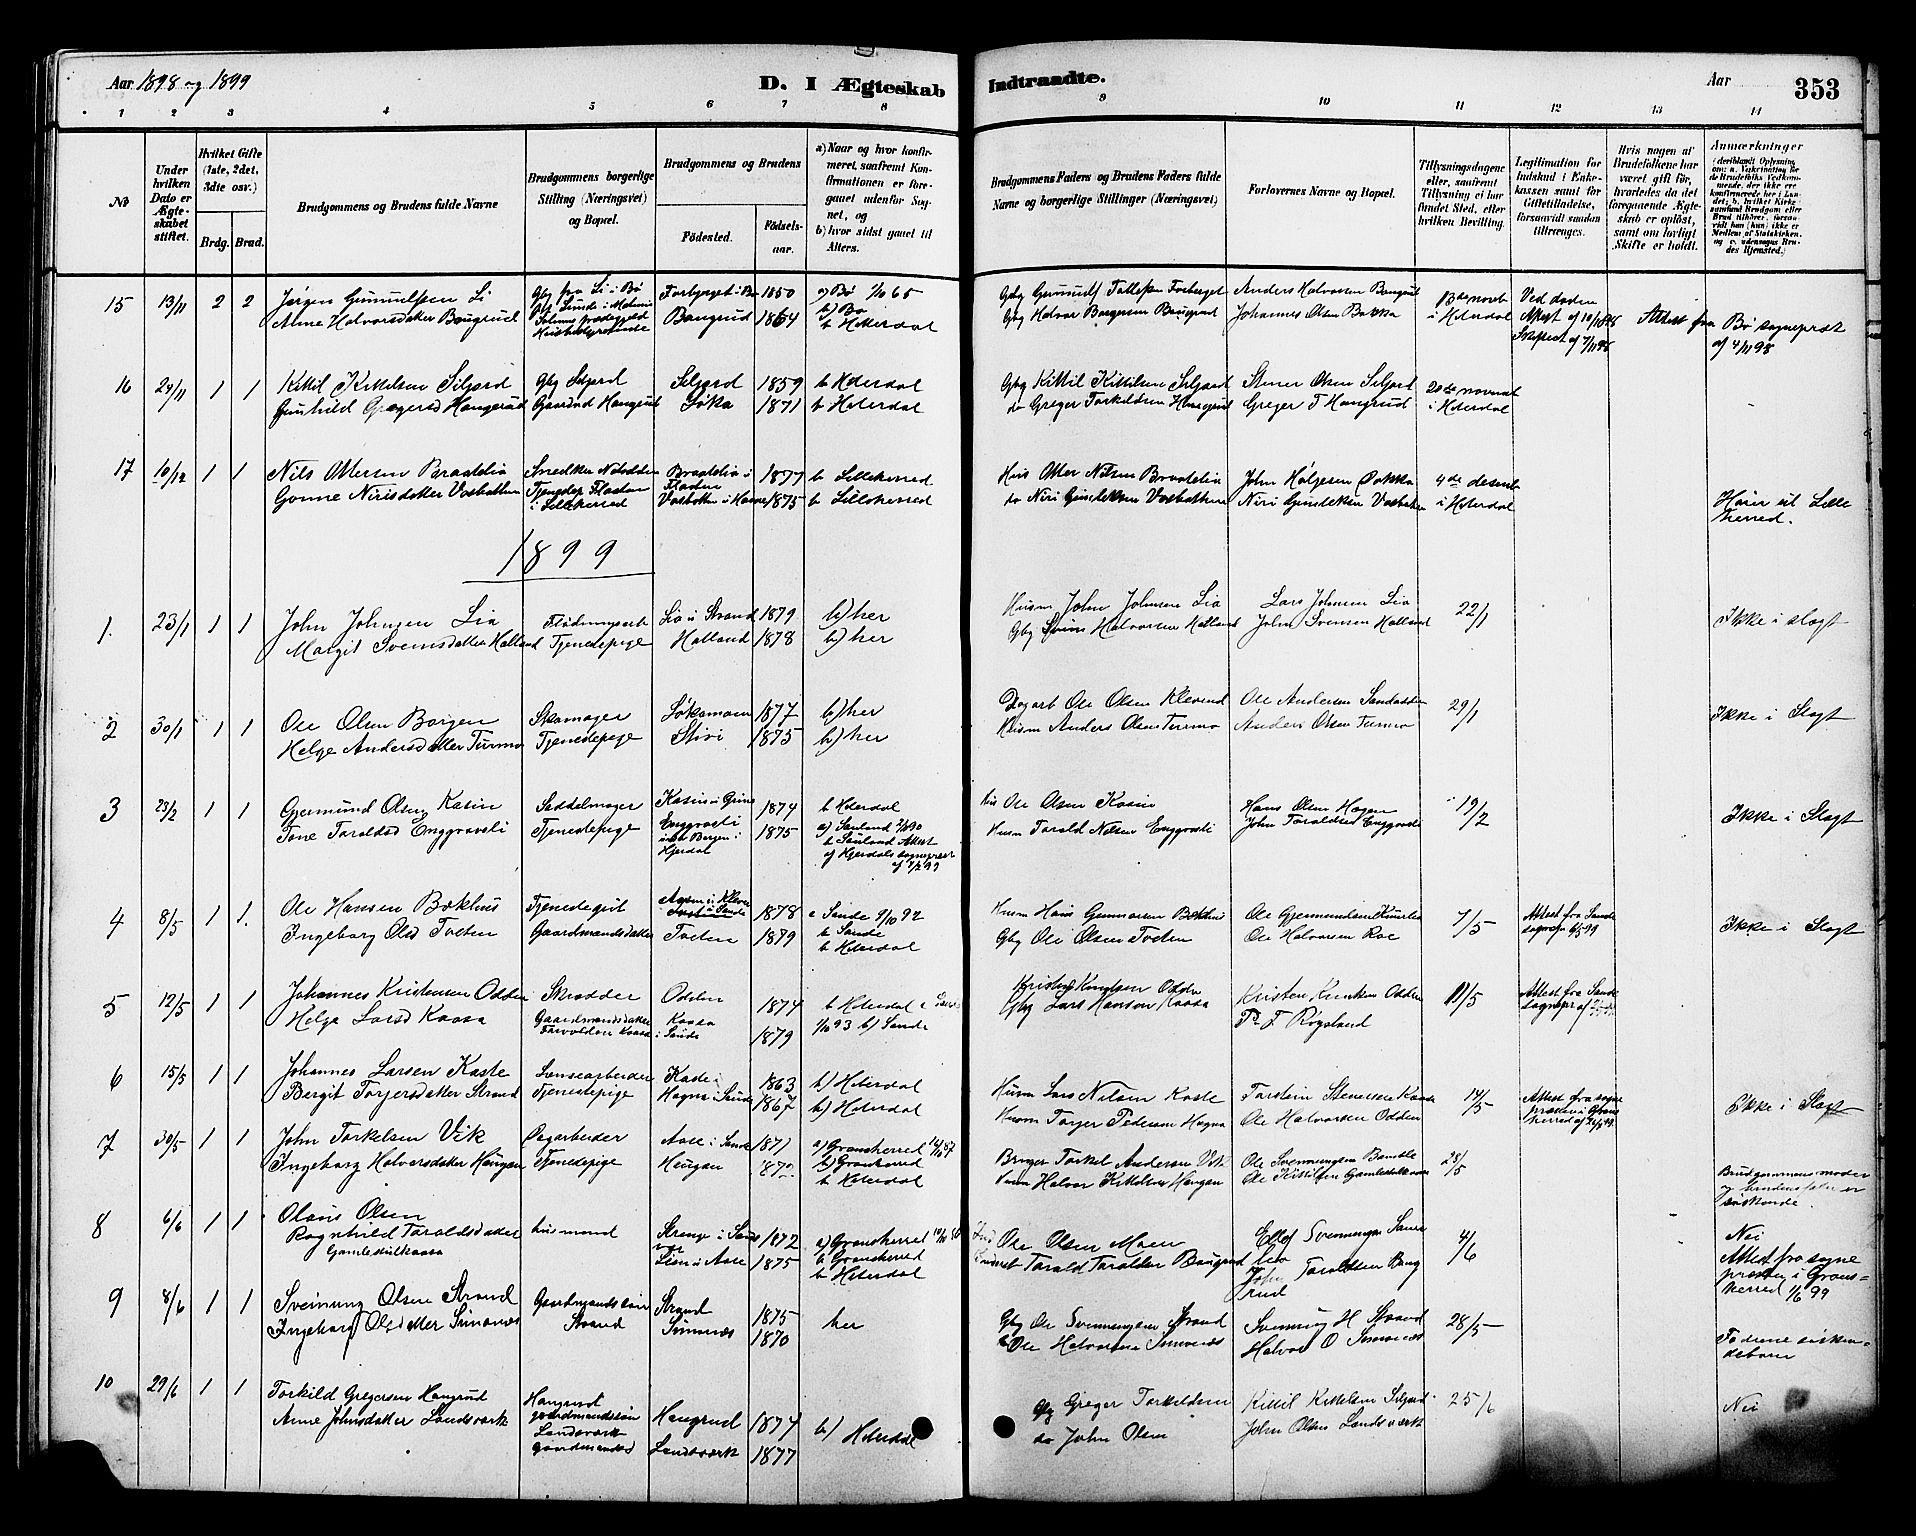 SAKO, Heddal kirkebøker, G/Ga/L0002: Klokkerbok nr. I 2, 1879-1908, s. 353